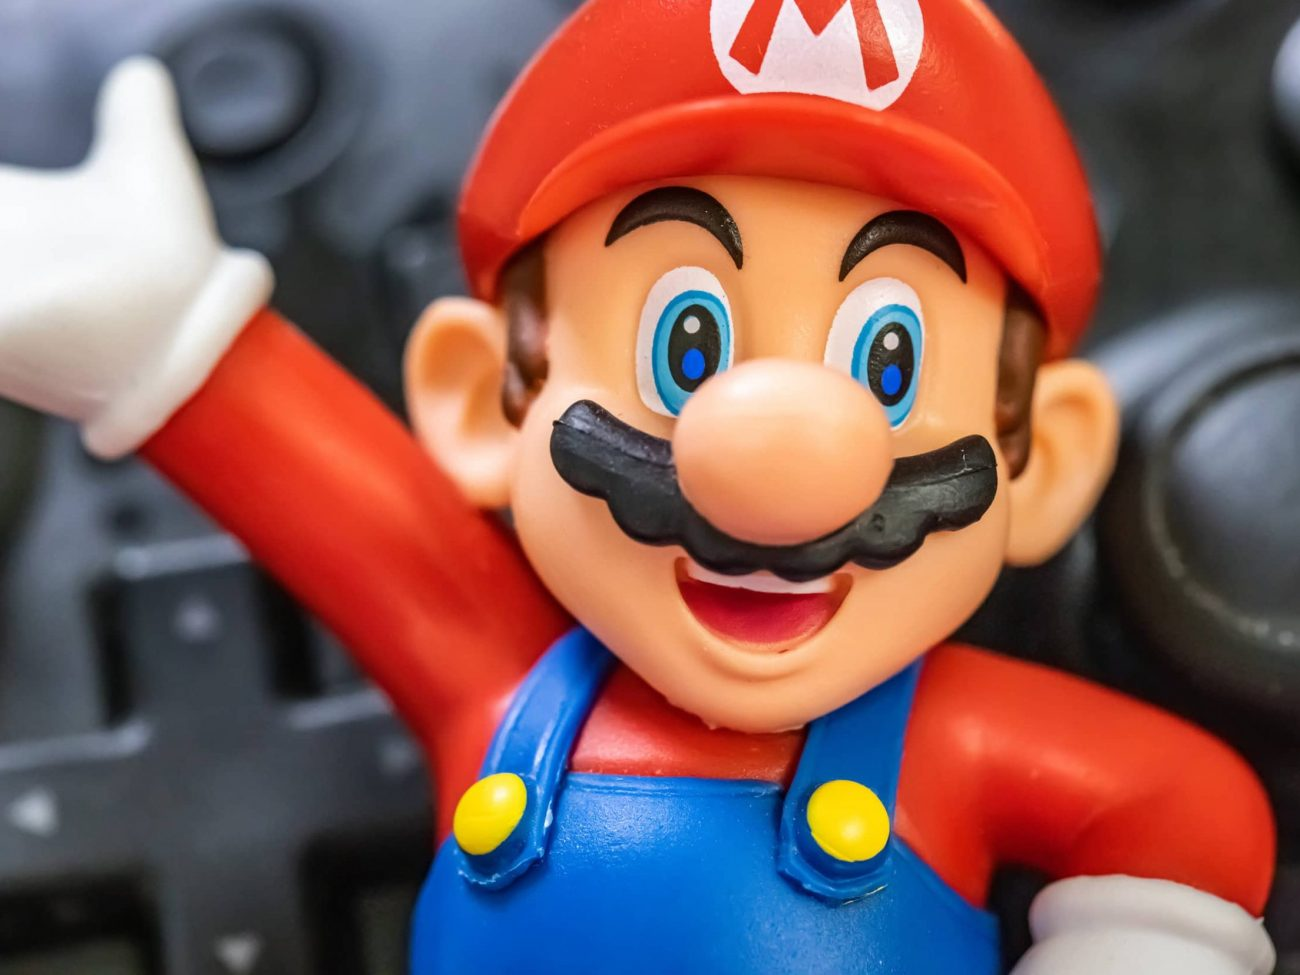 Charles Martinet compte bien doubler Mario jusqu'à sa mort